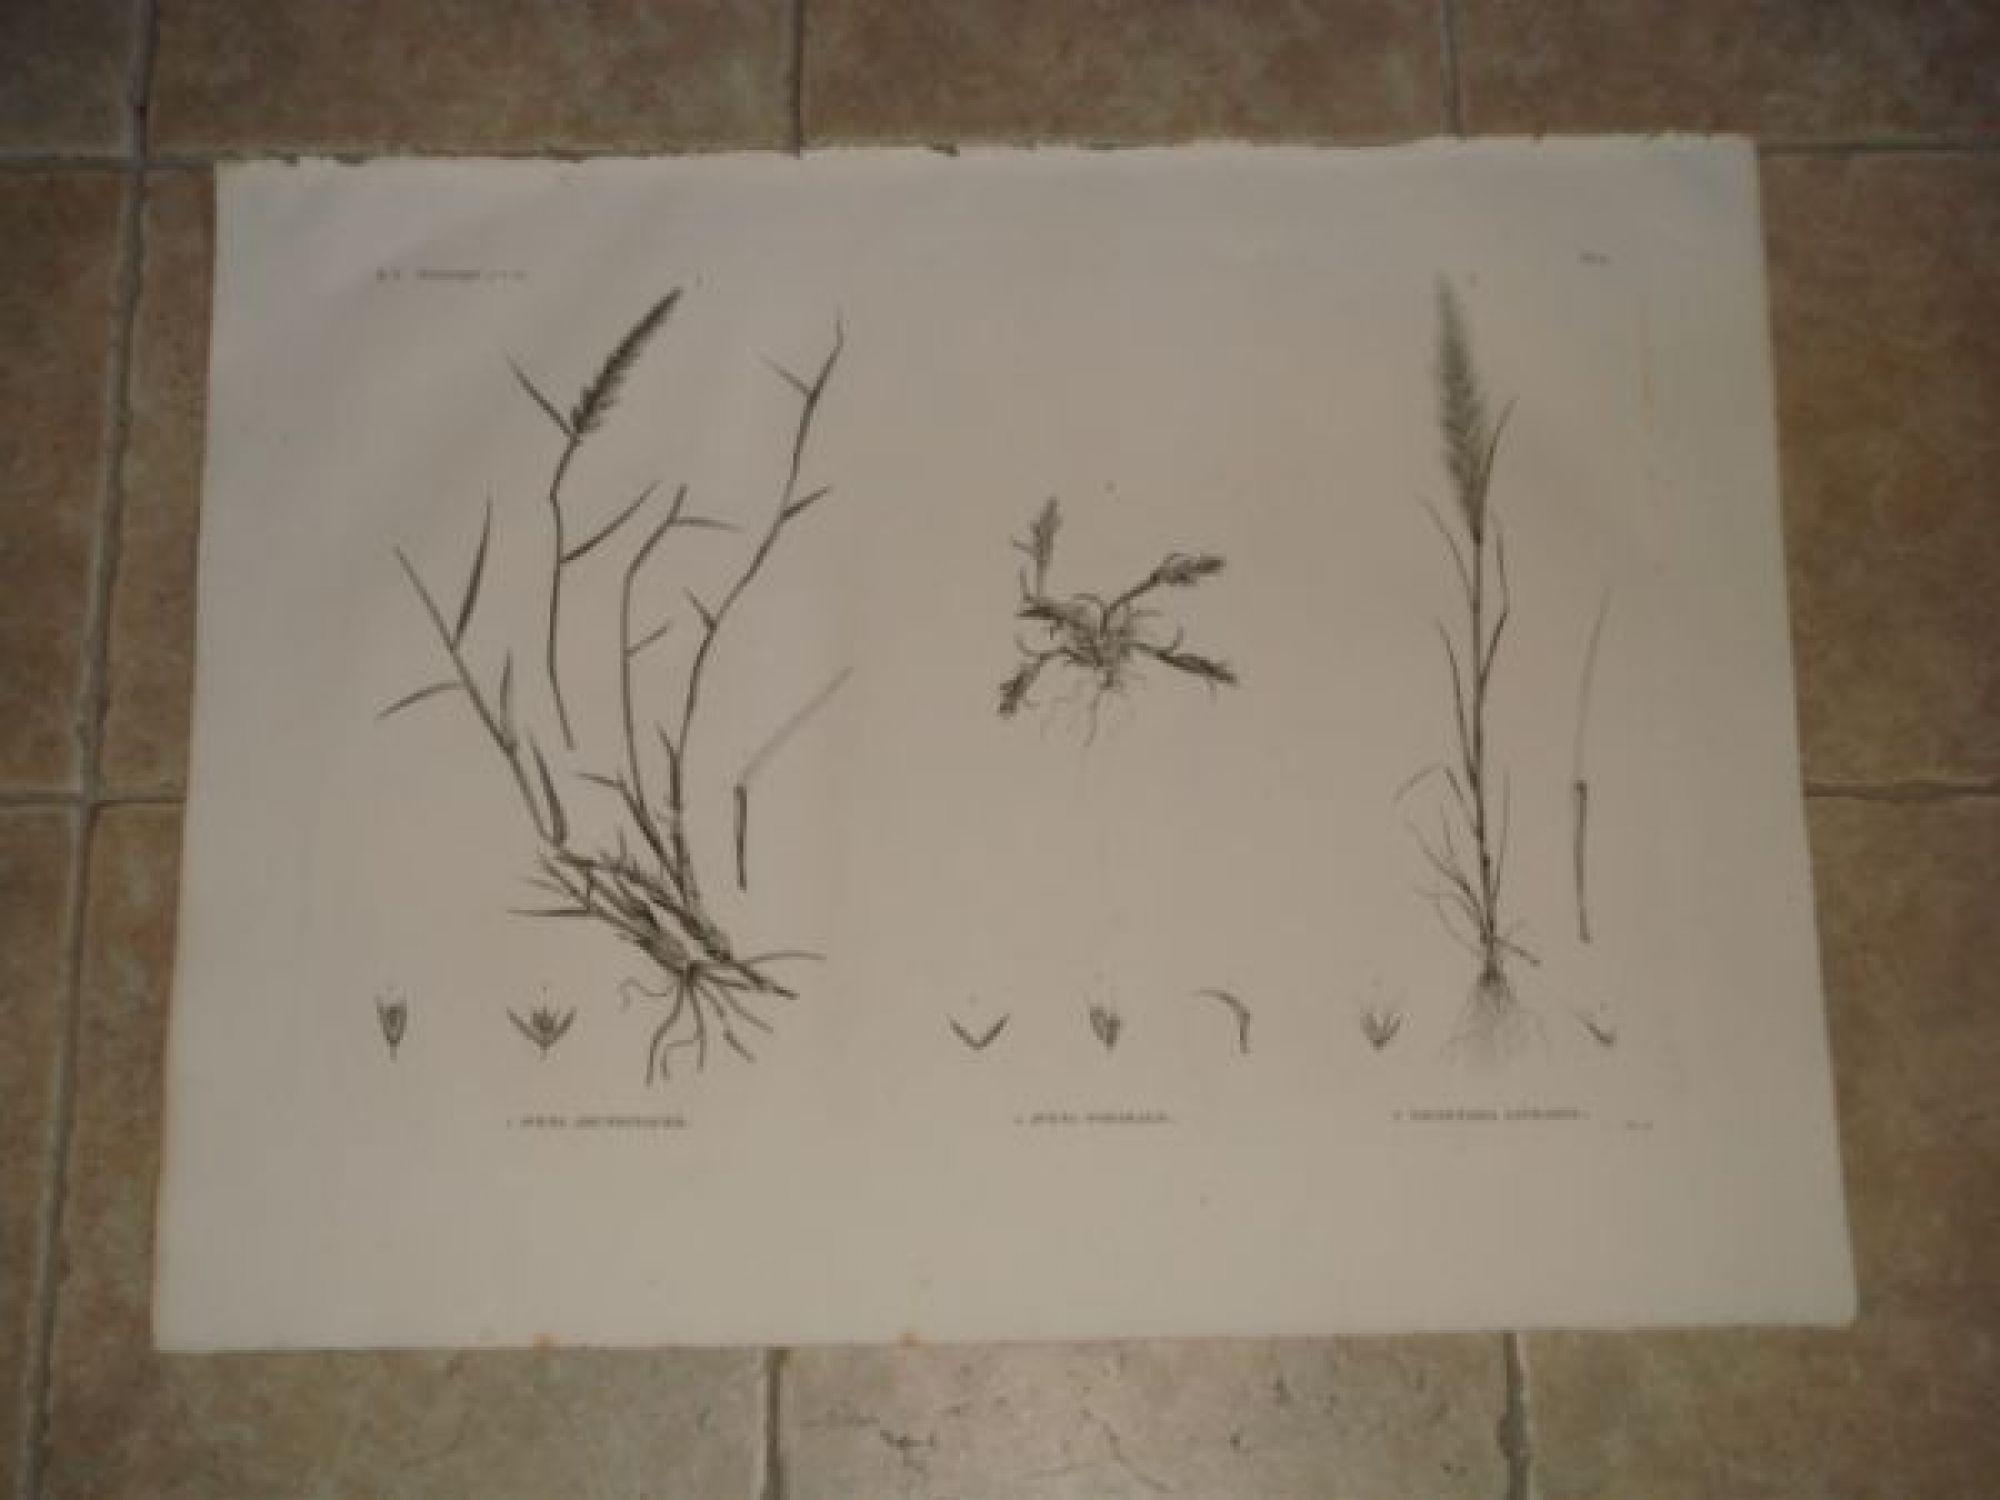 description de l 39 egypte botanique avena arundinacea avena forskalii trisetaria linearis. Black Bedroom Furniture Sets. Home Design Ideas